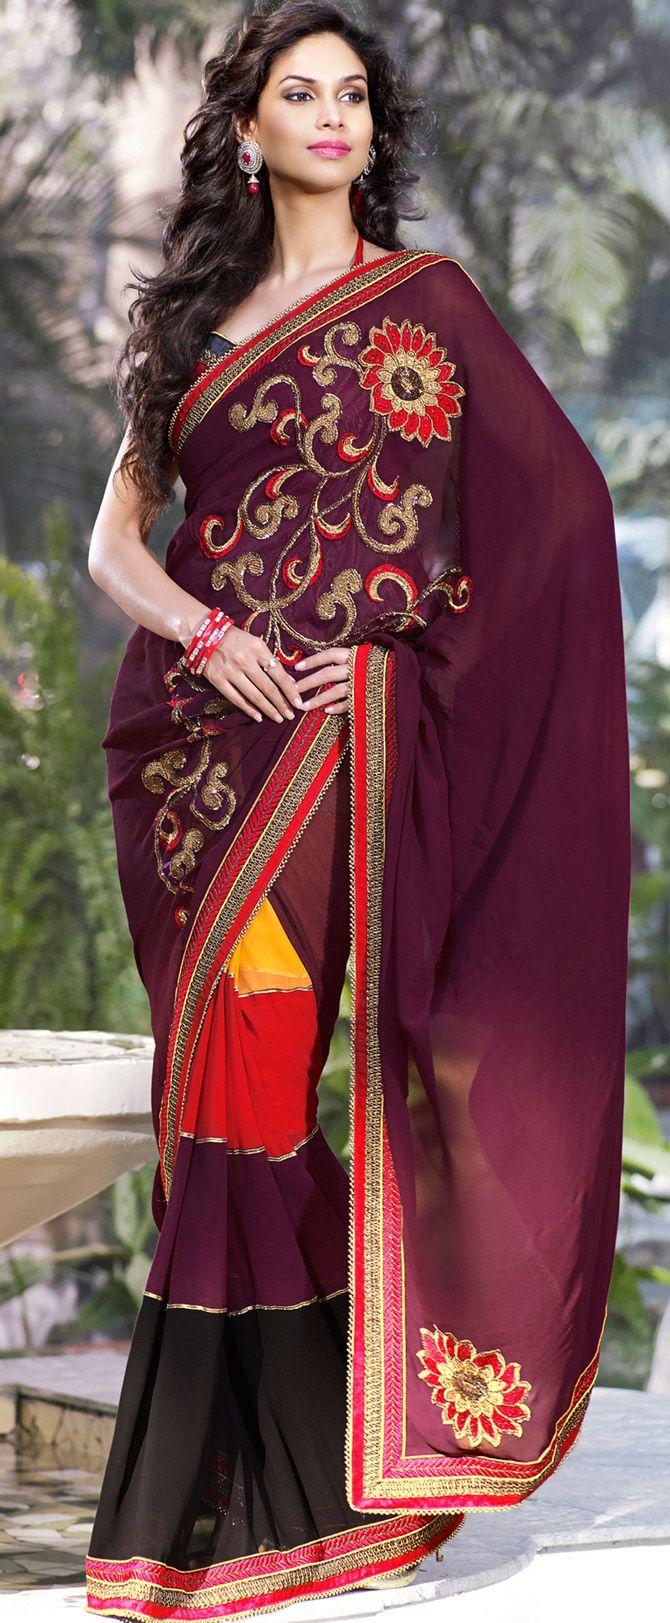 Women fashion saree indian women fashion  exploring my past history  pinterest